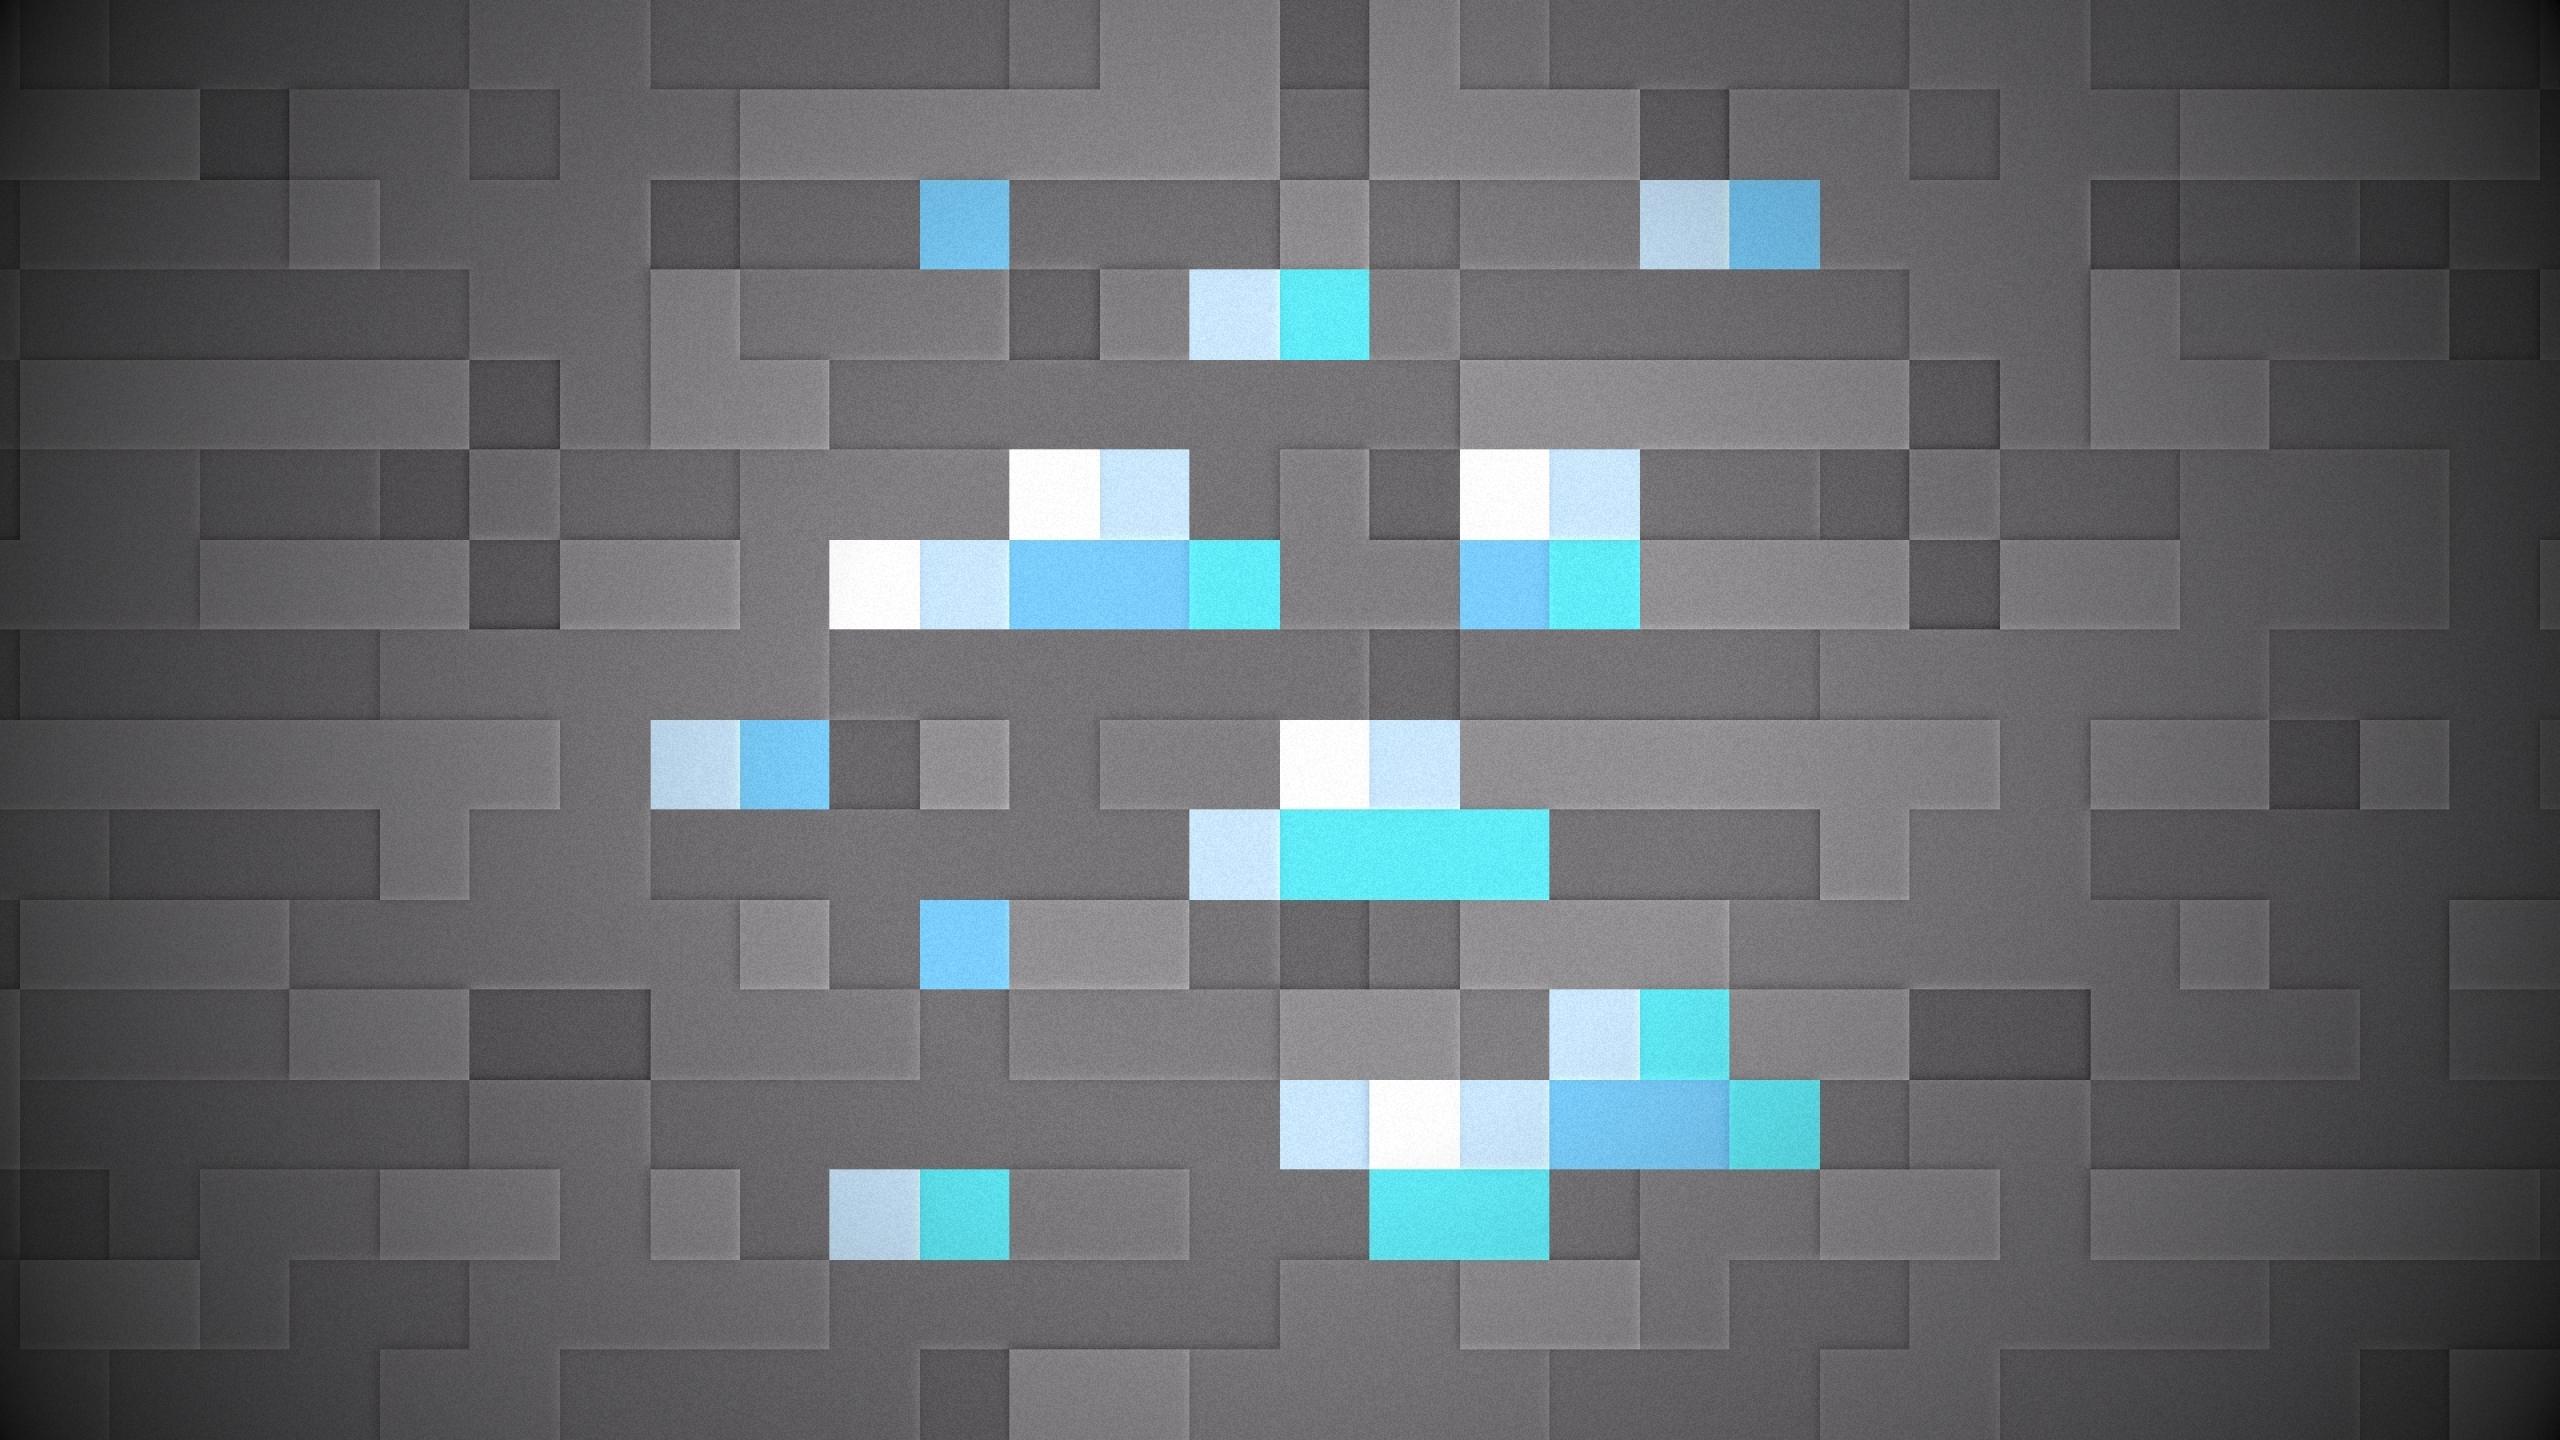 minecraft sprite diamond 1920x1080 wallpaper Art HD Wallpaper download 2560x1440